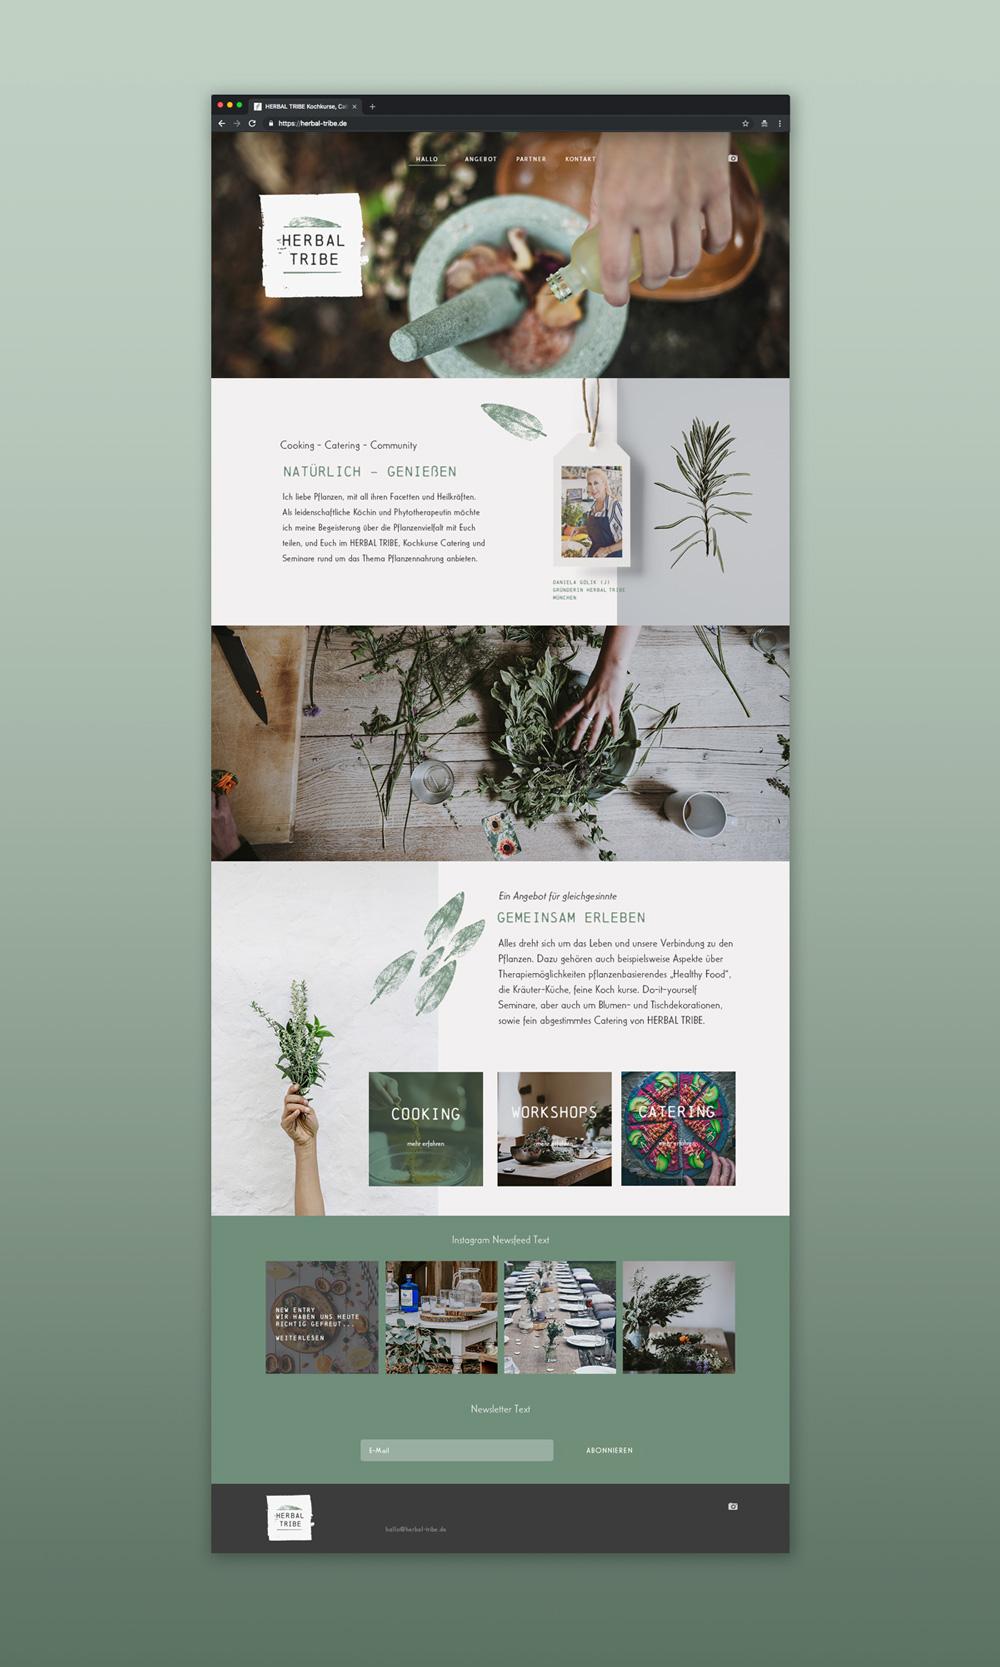 Michael-seidl-webdesign-herbal-tribe.jpg